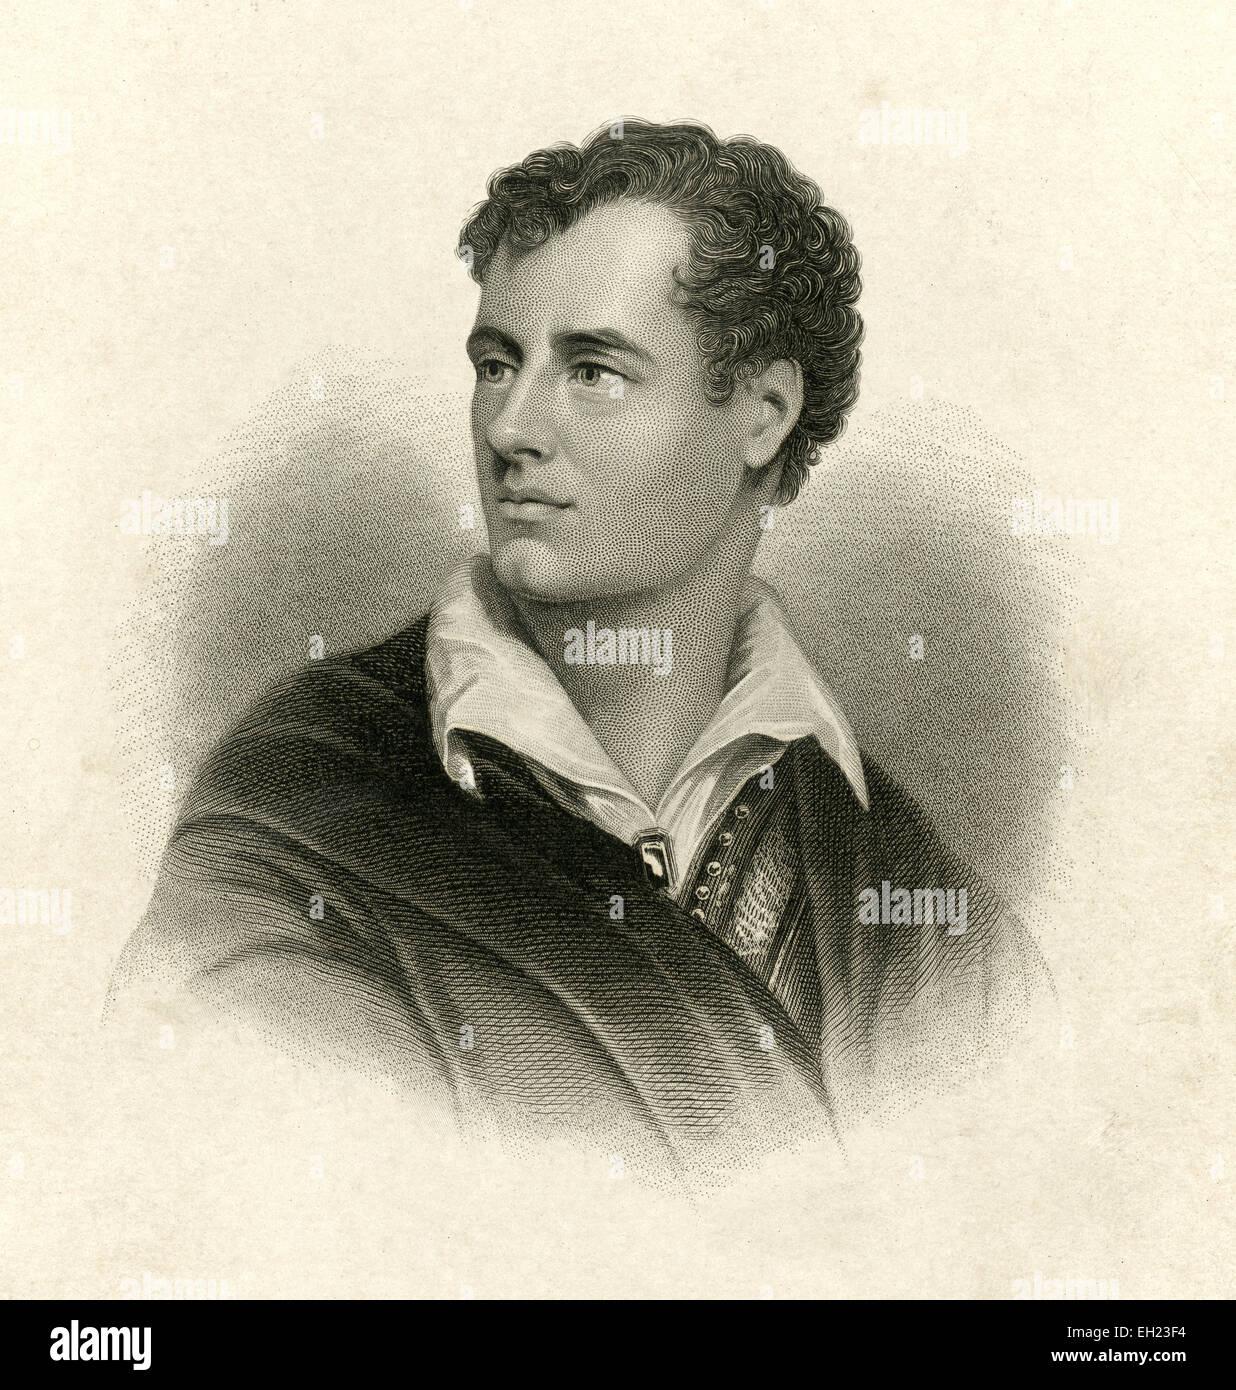 a review of george gordon noel byrons poem she walks in beauty Free essay: george gordon, lord byron, born in 1788 and died in 1824,  gordon noel byron's poem she walks in beauty george gordon.